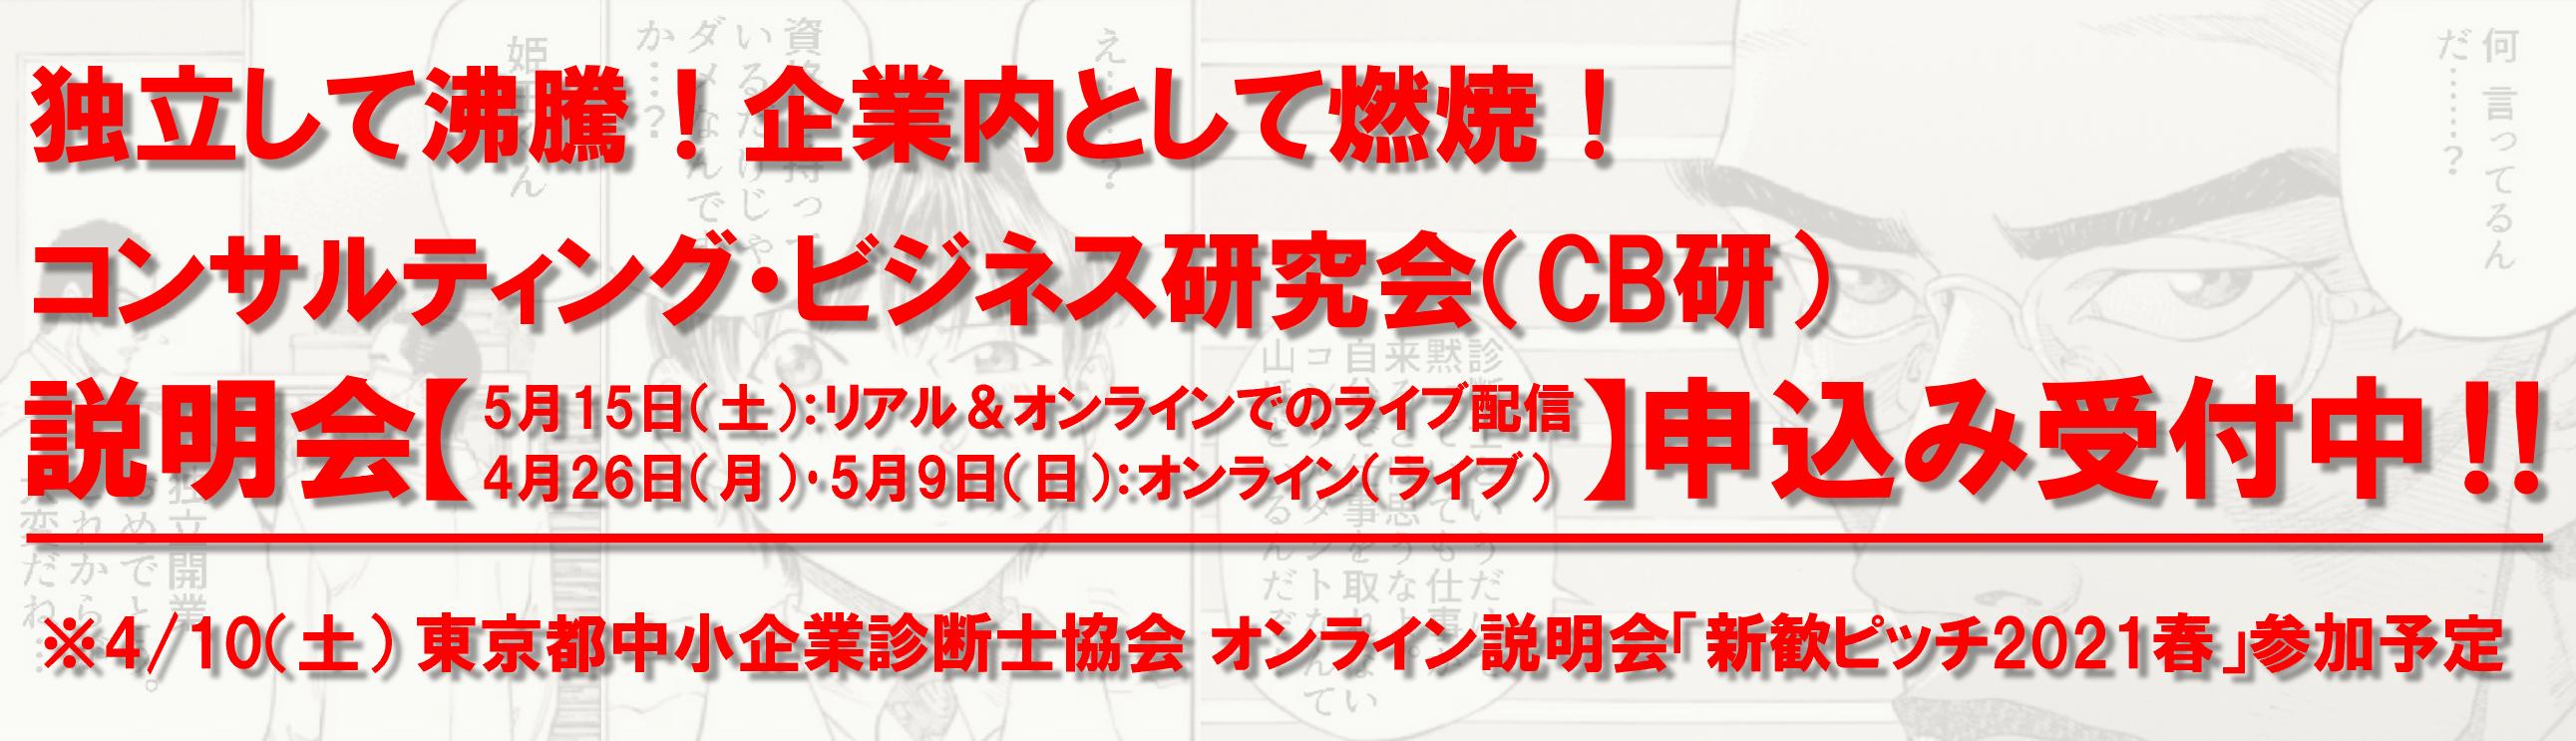 東京都中小企業診断士協会公認CB研究会 リアル&オンライン説明会申込み受付中